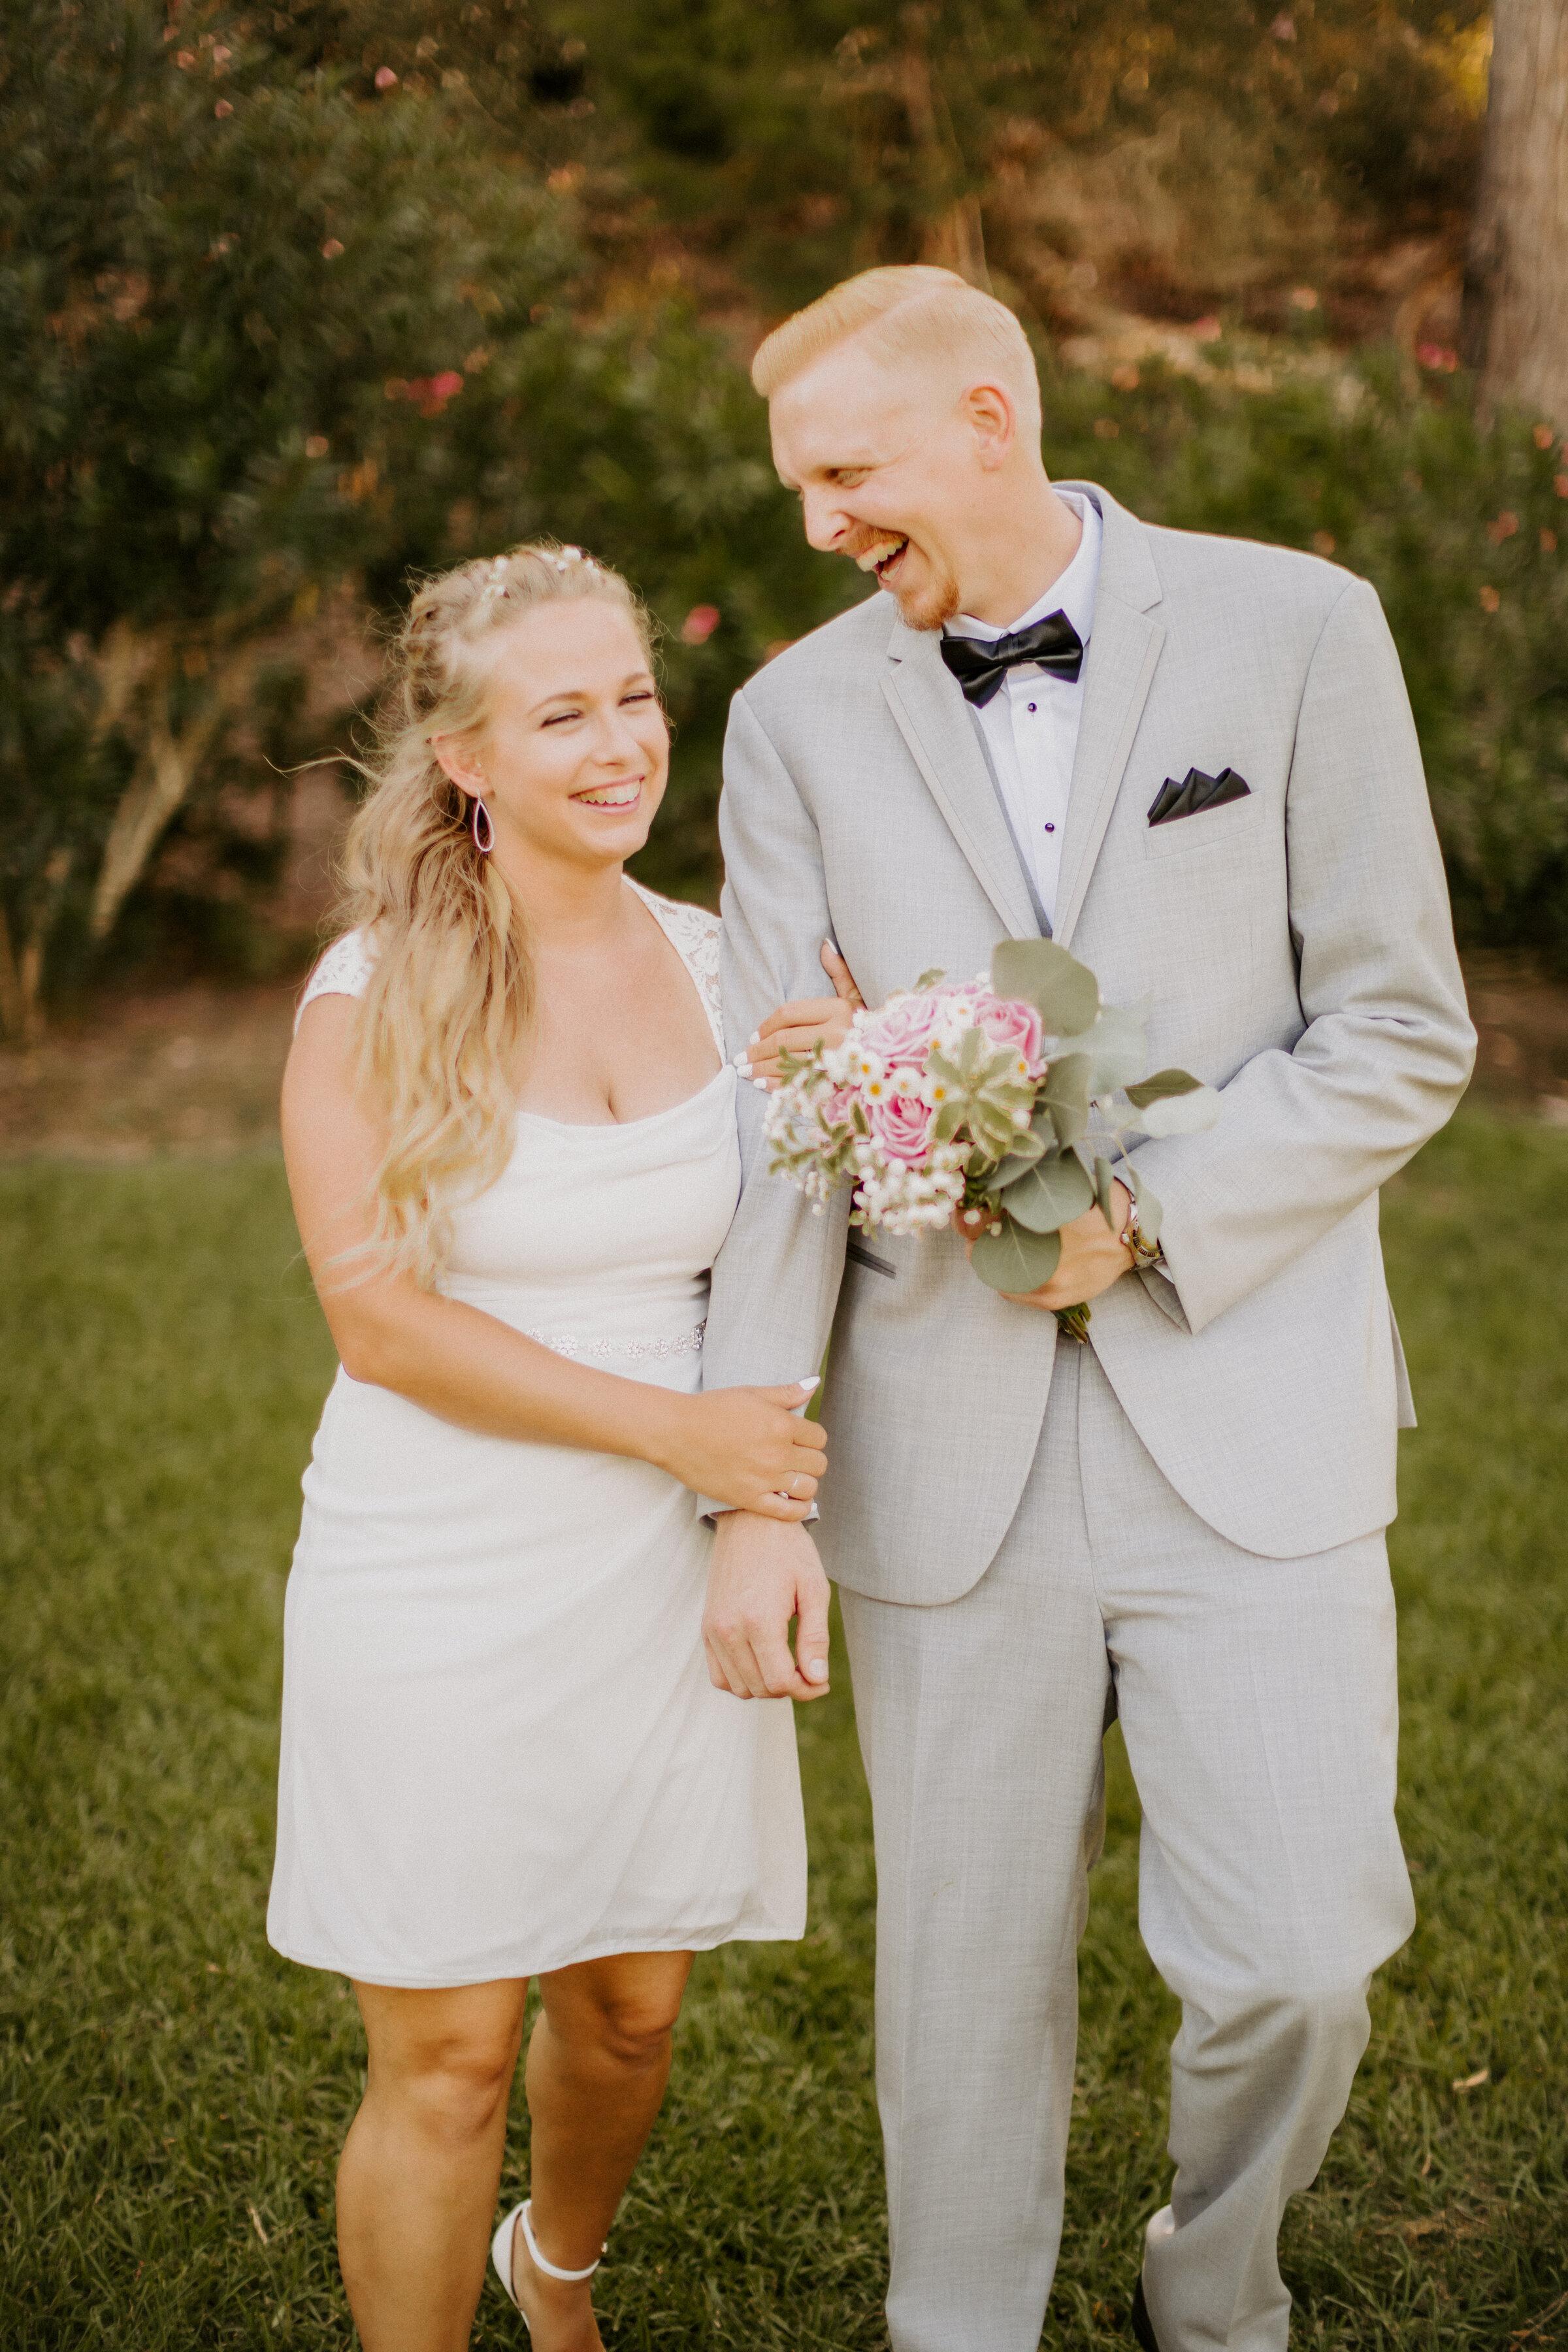 amphoto kj vowel renewal bridals-82.jpg